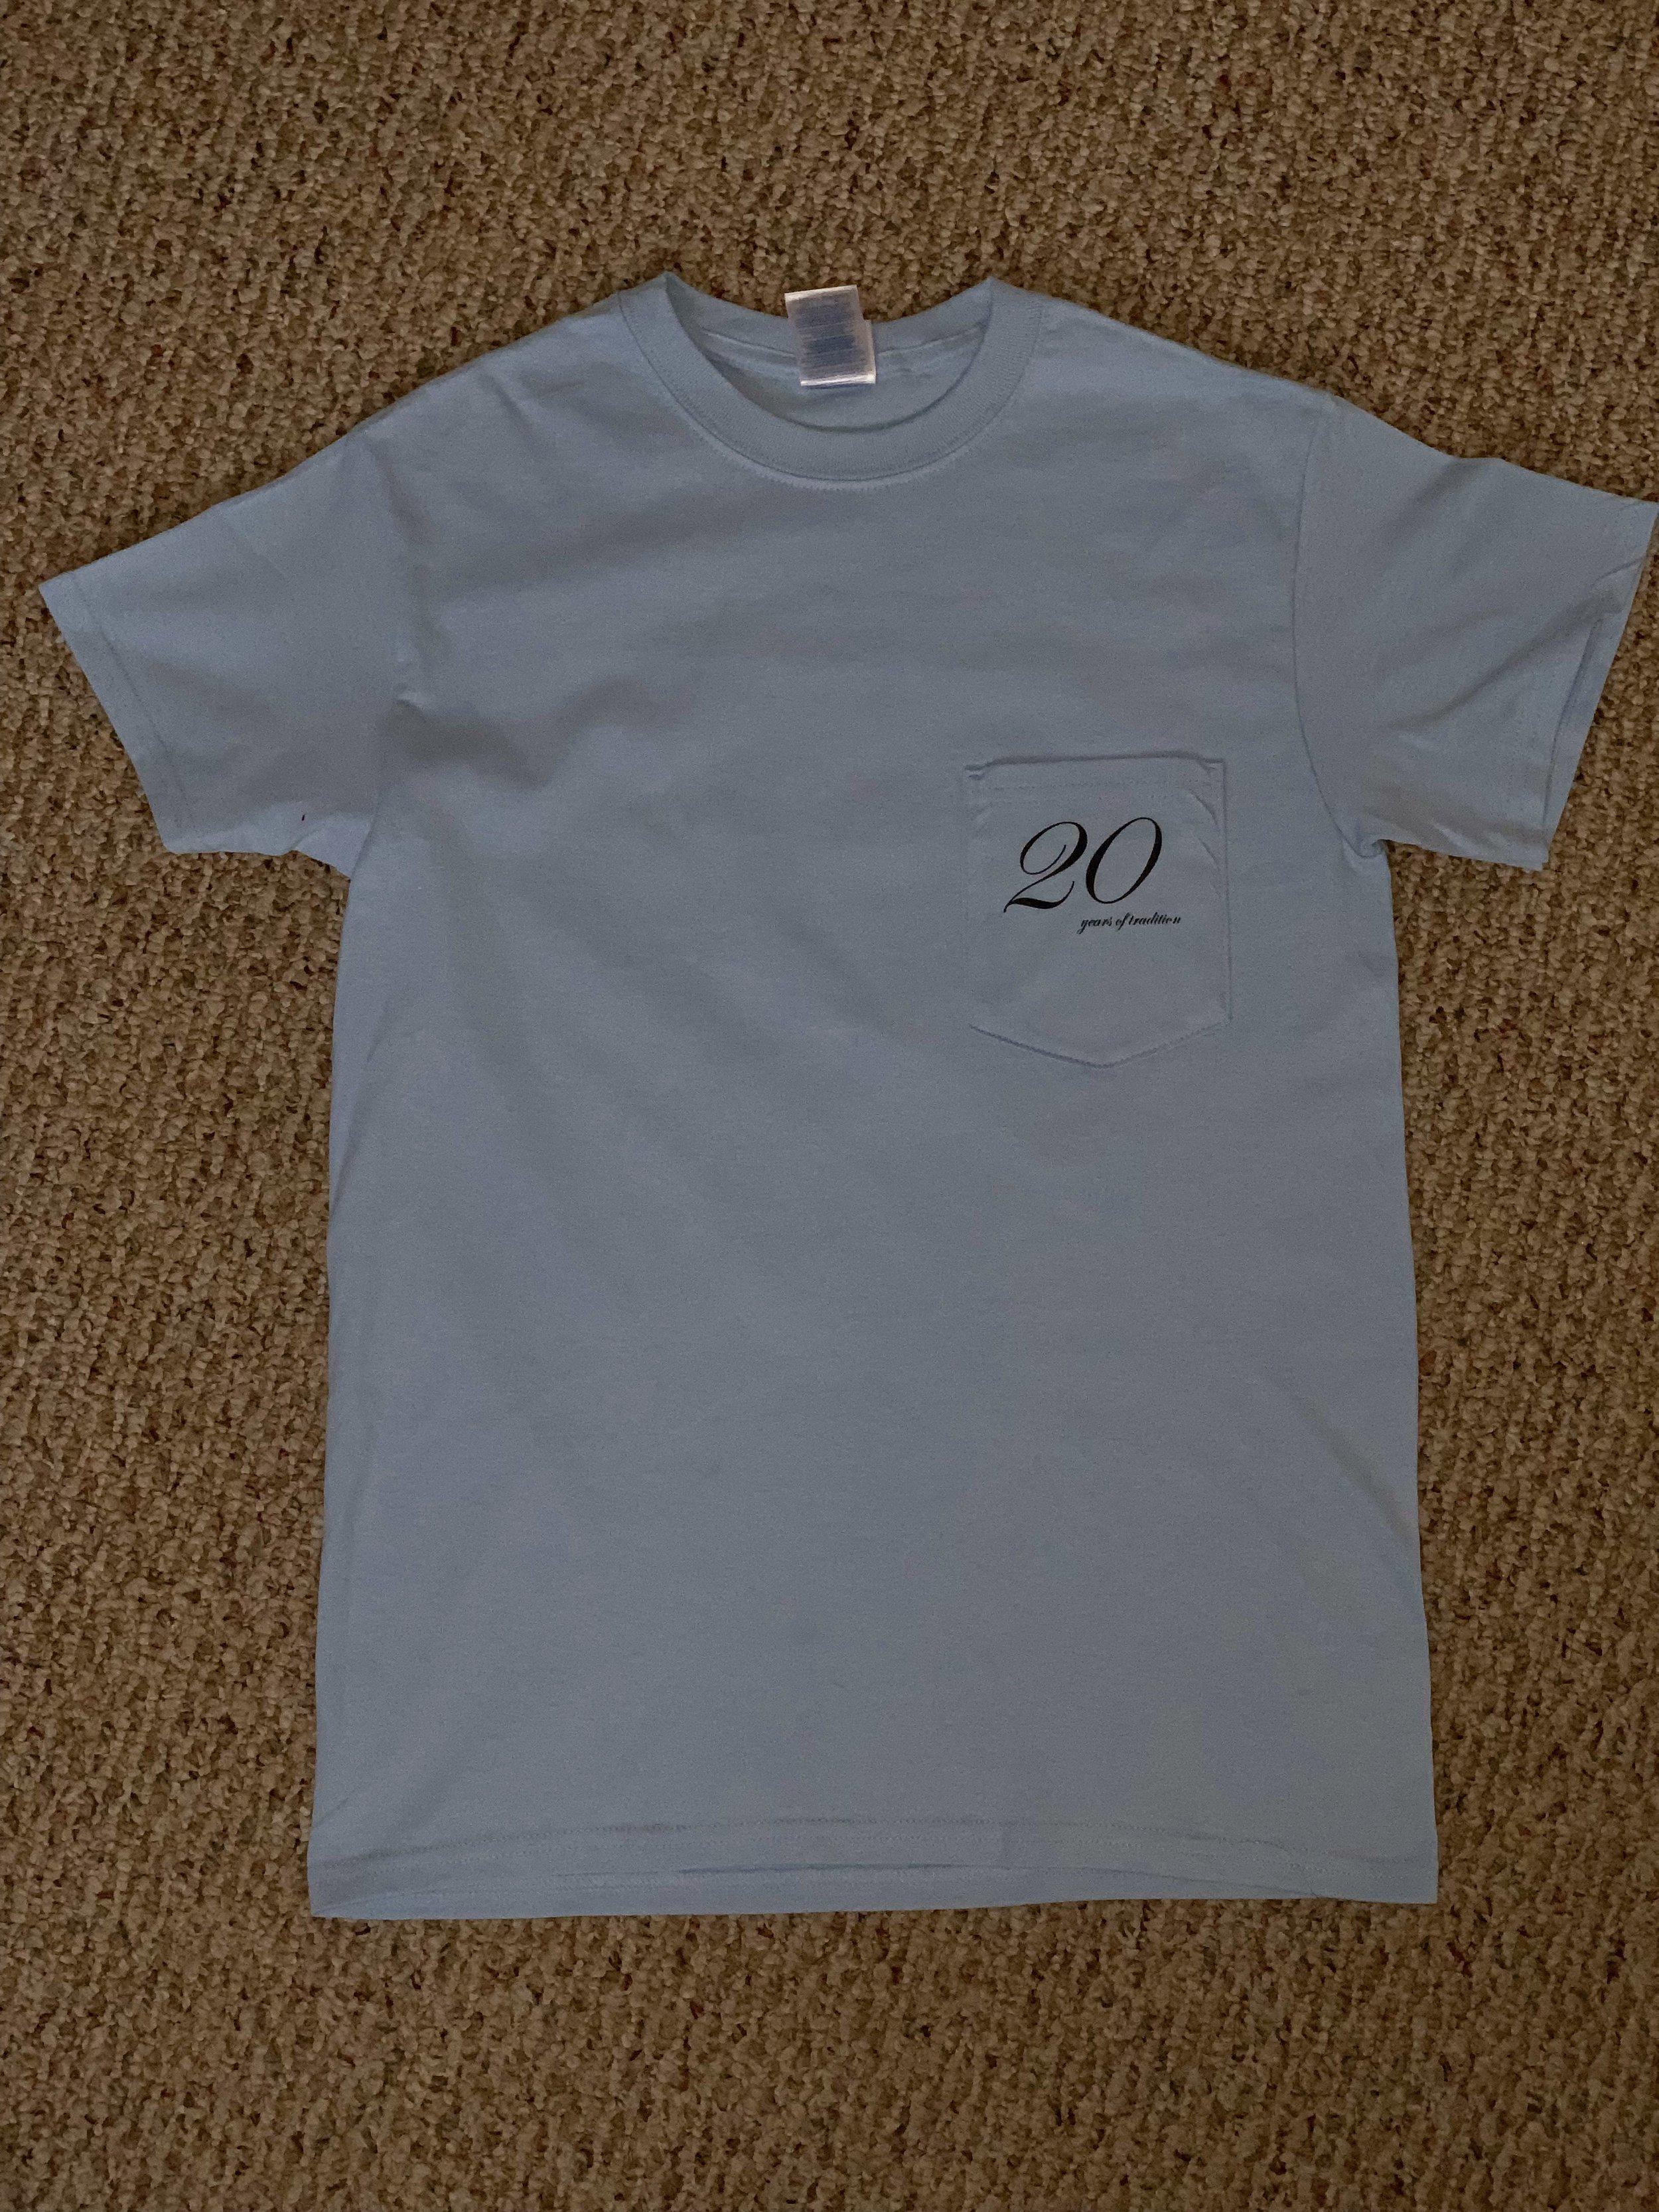 Sampradaya 20 years Shirt (Light Blue color) — FRONT